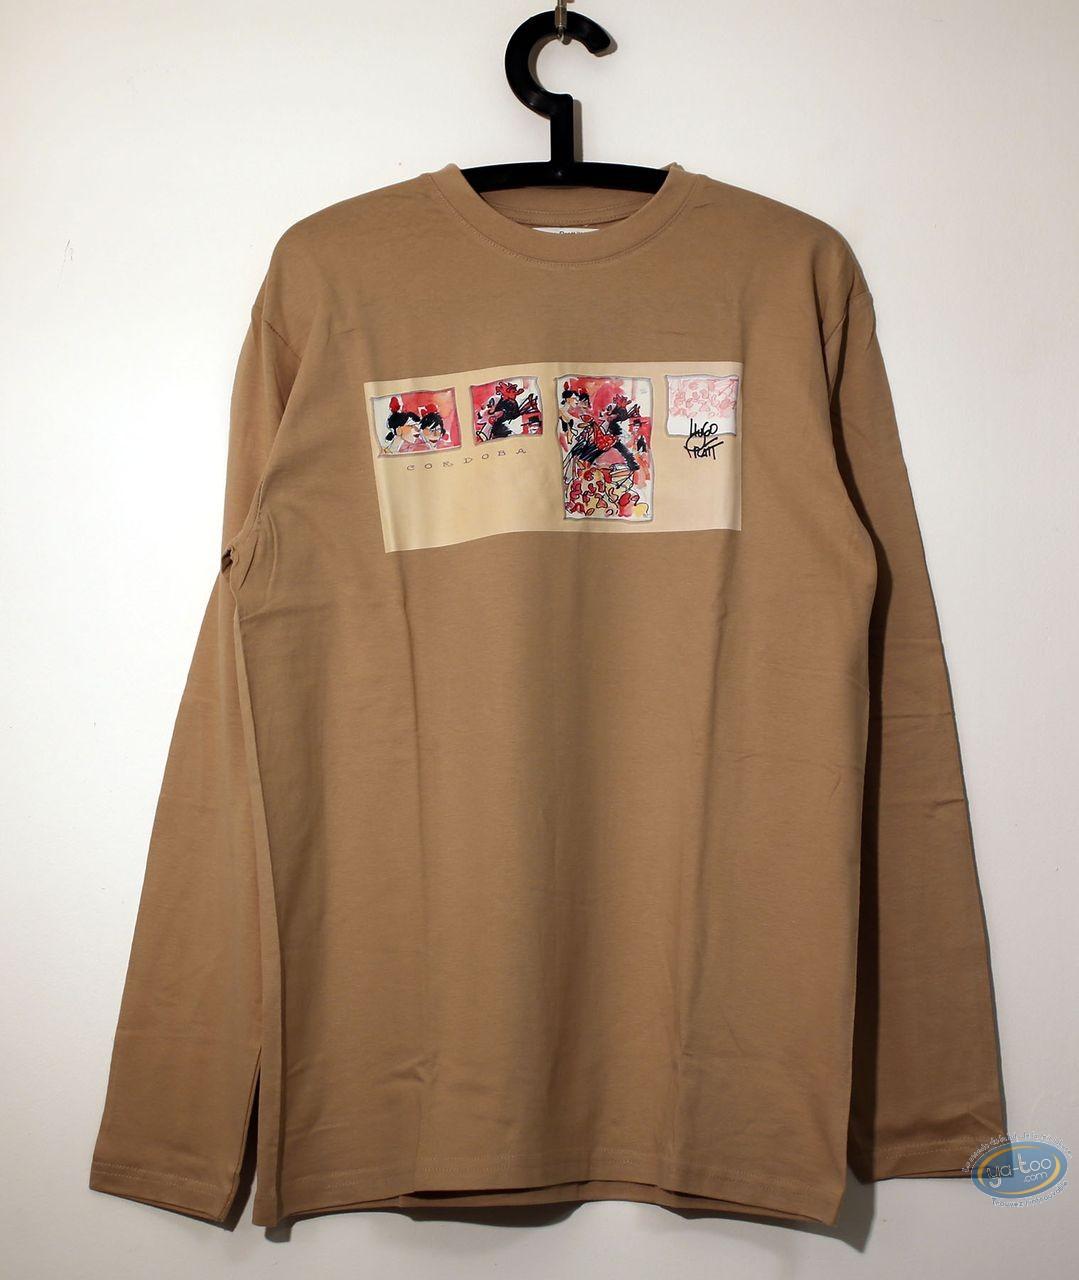 Vêtement, Corto Maltese : T-shirt, Mixte Cordoba 01-02 bis taille S